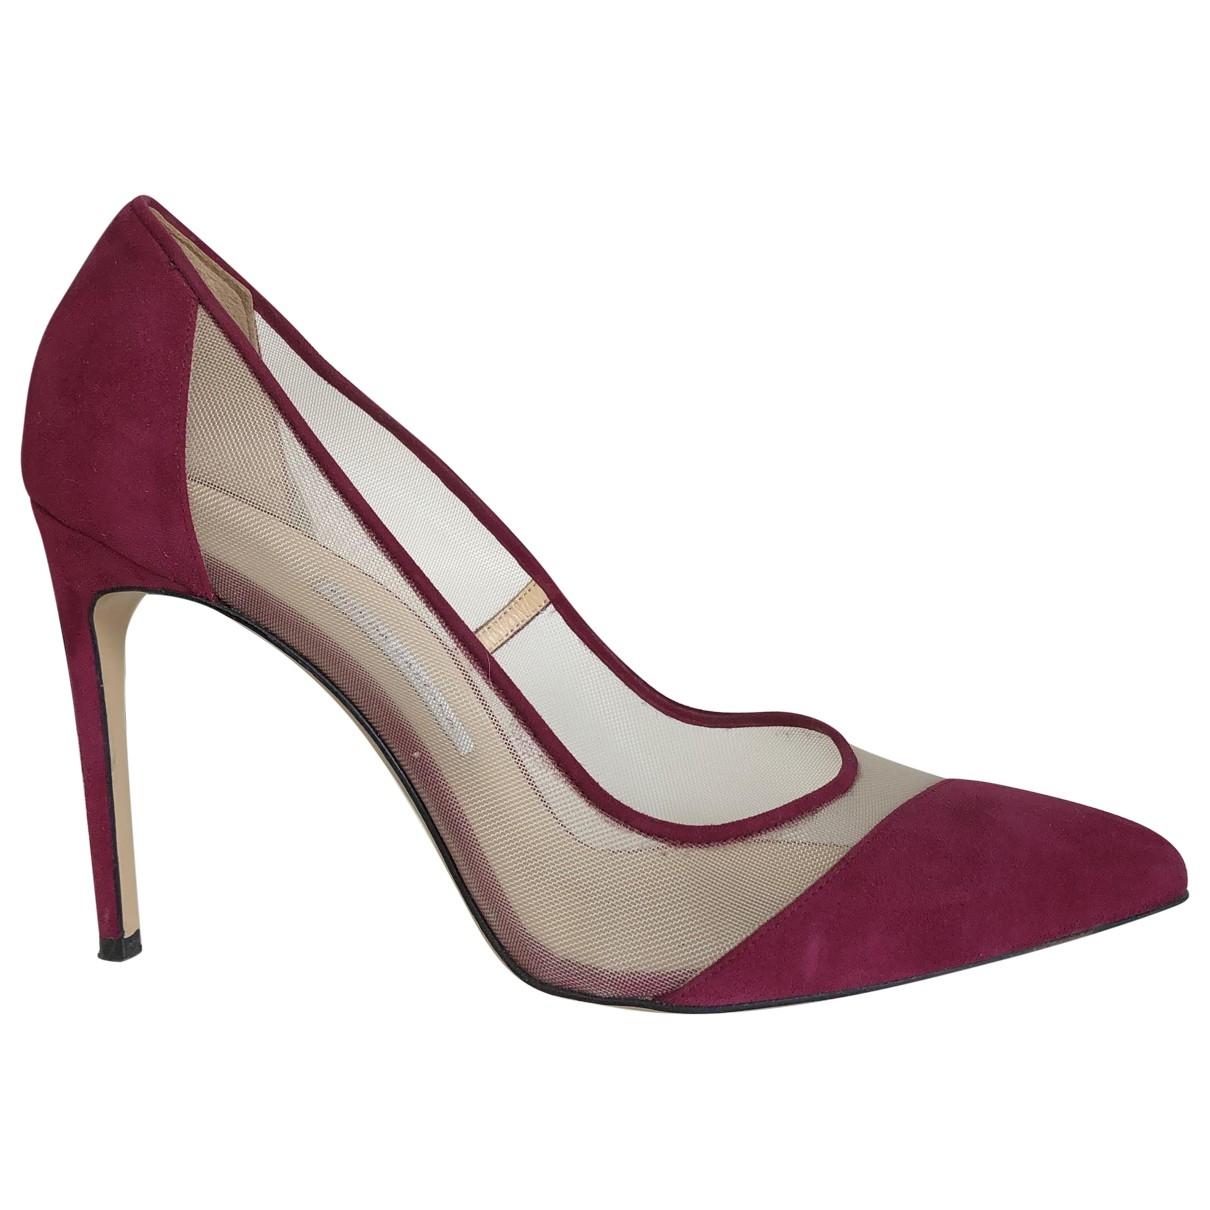 Bionda Castana \N Pink Suede Heels for Women 38.5 EU